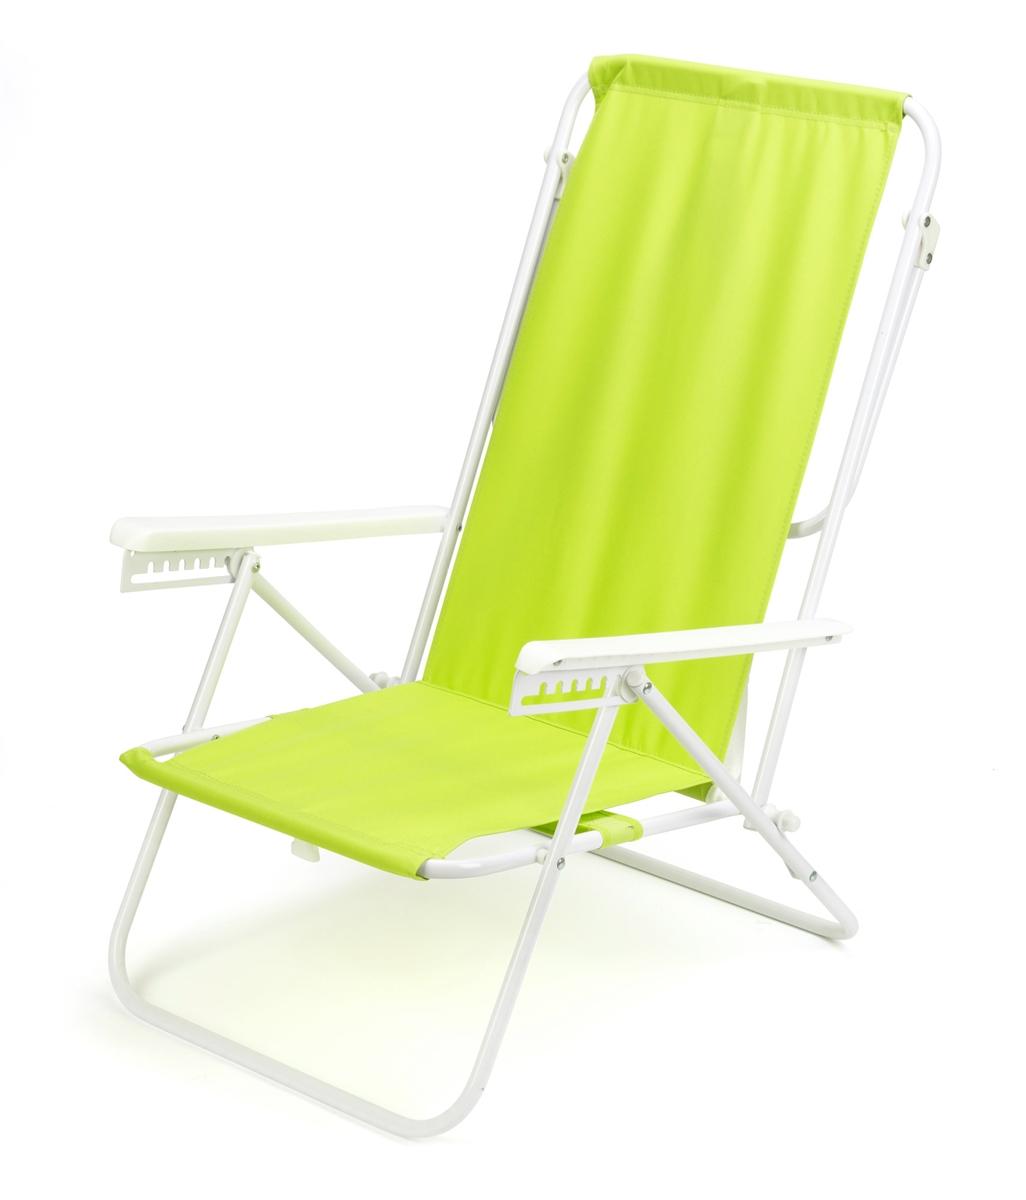 Brilliant 7 Position High Back Steel Tube Beach Chair By Trademark Innovations Light Green Frankydiablos Diy Chair Ideas Frankydiabloscom